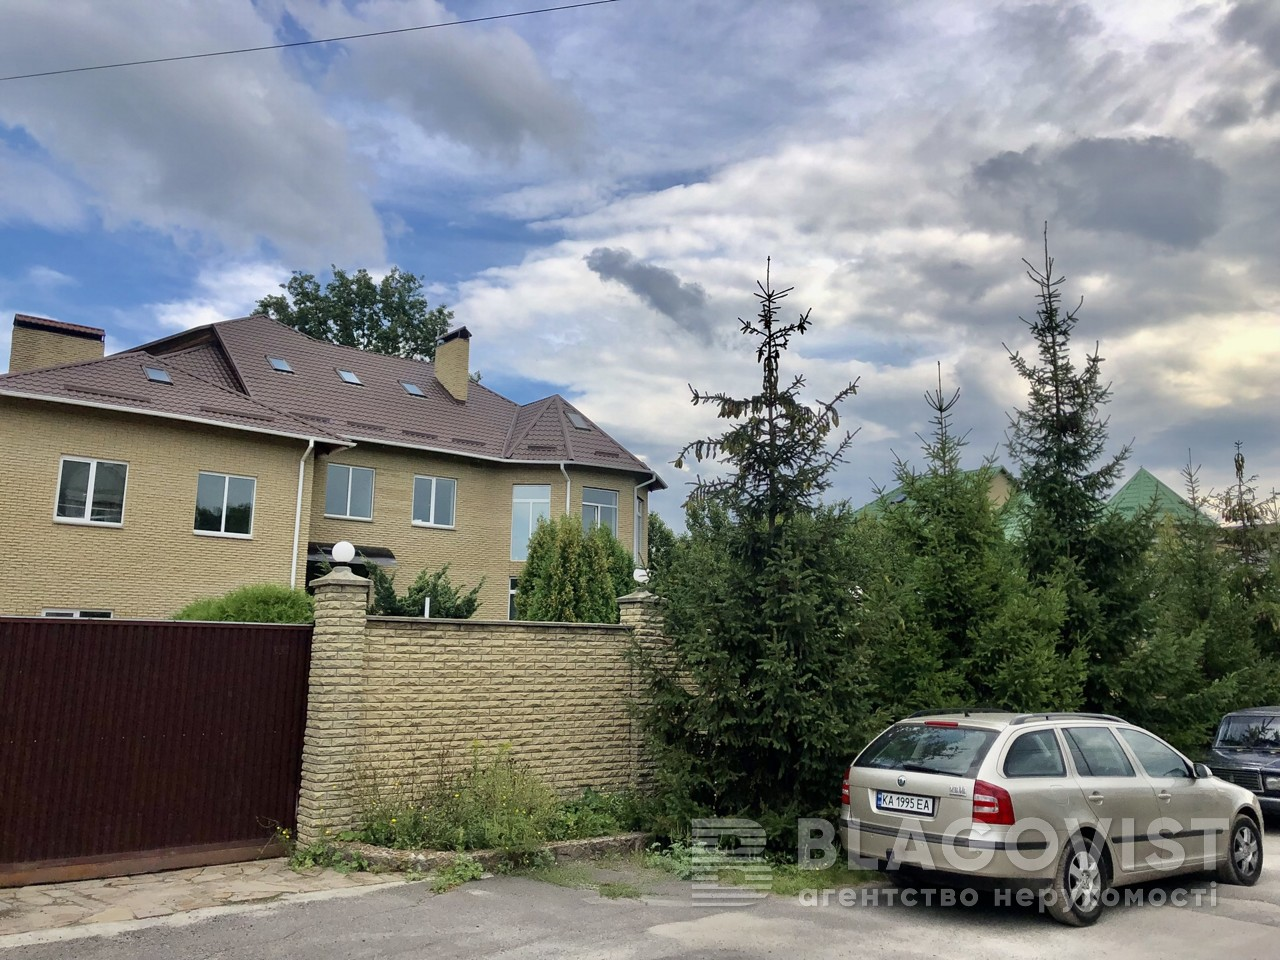 Квартира C-109816, Клавдии Радченко, 14, Киев - Фото 15